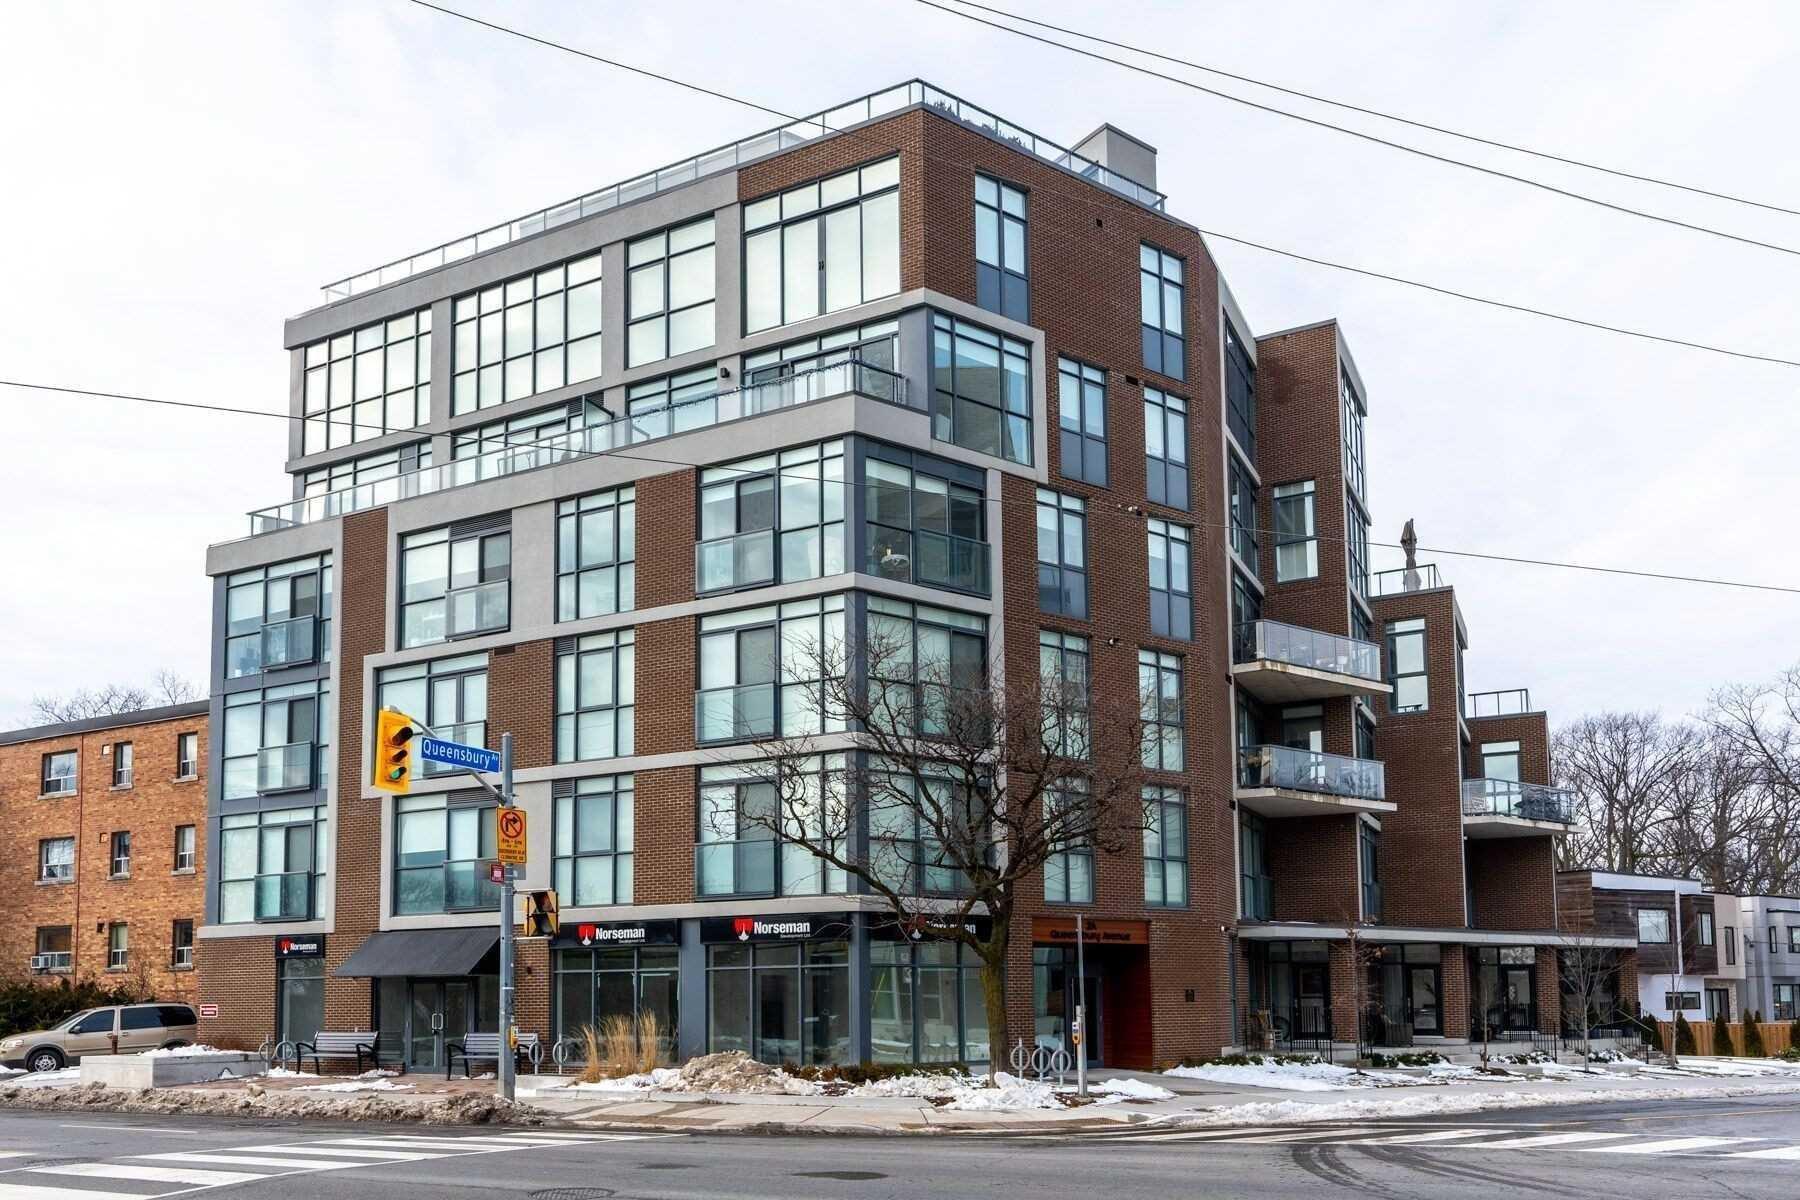 Main Photo: 105 1340 Kingston Road in Toronto: Birchcliffe-Cliffside Property for sale (Toronto E06)  : MLS®# E4738863